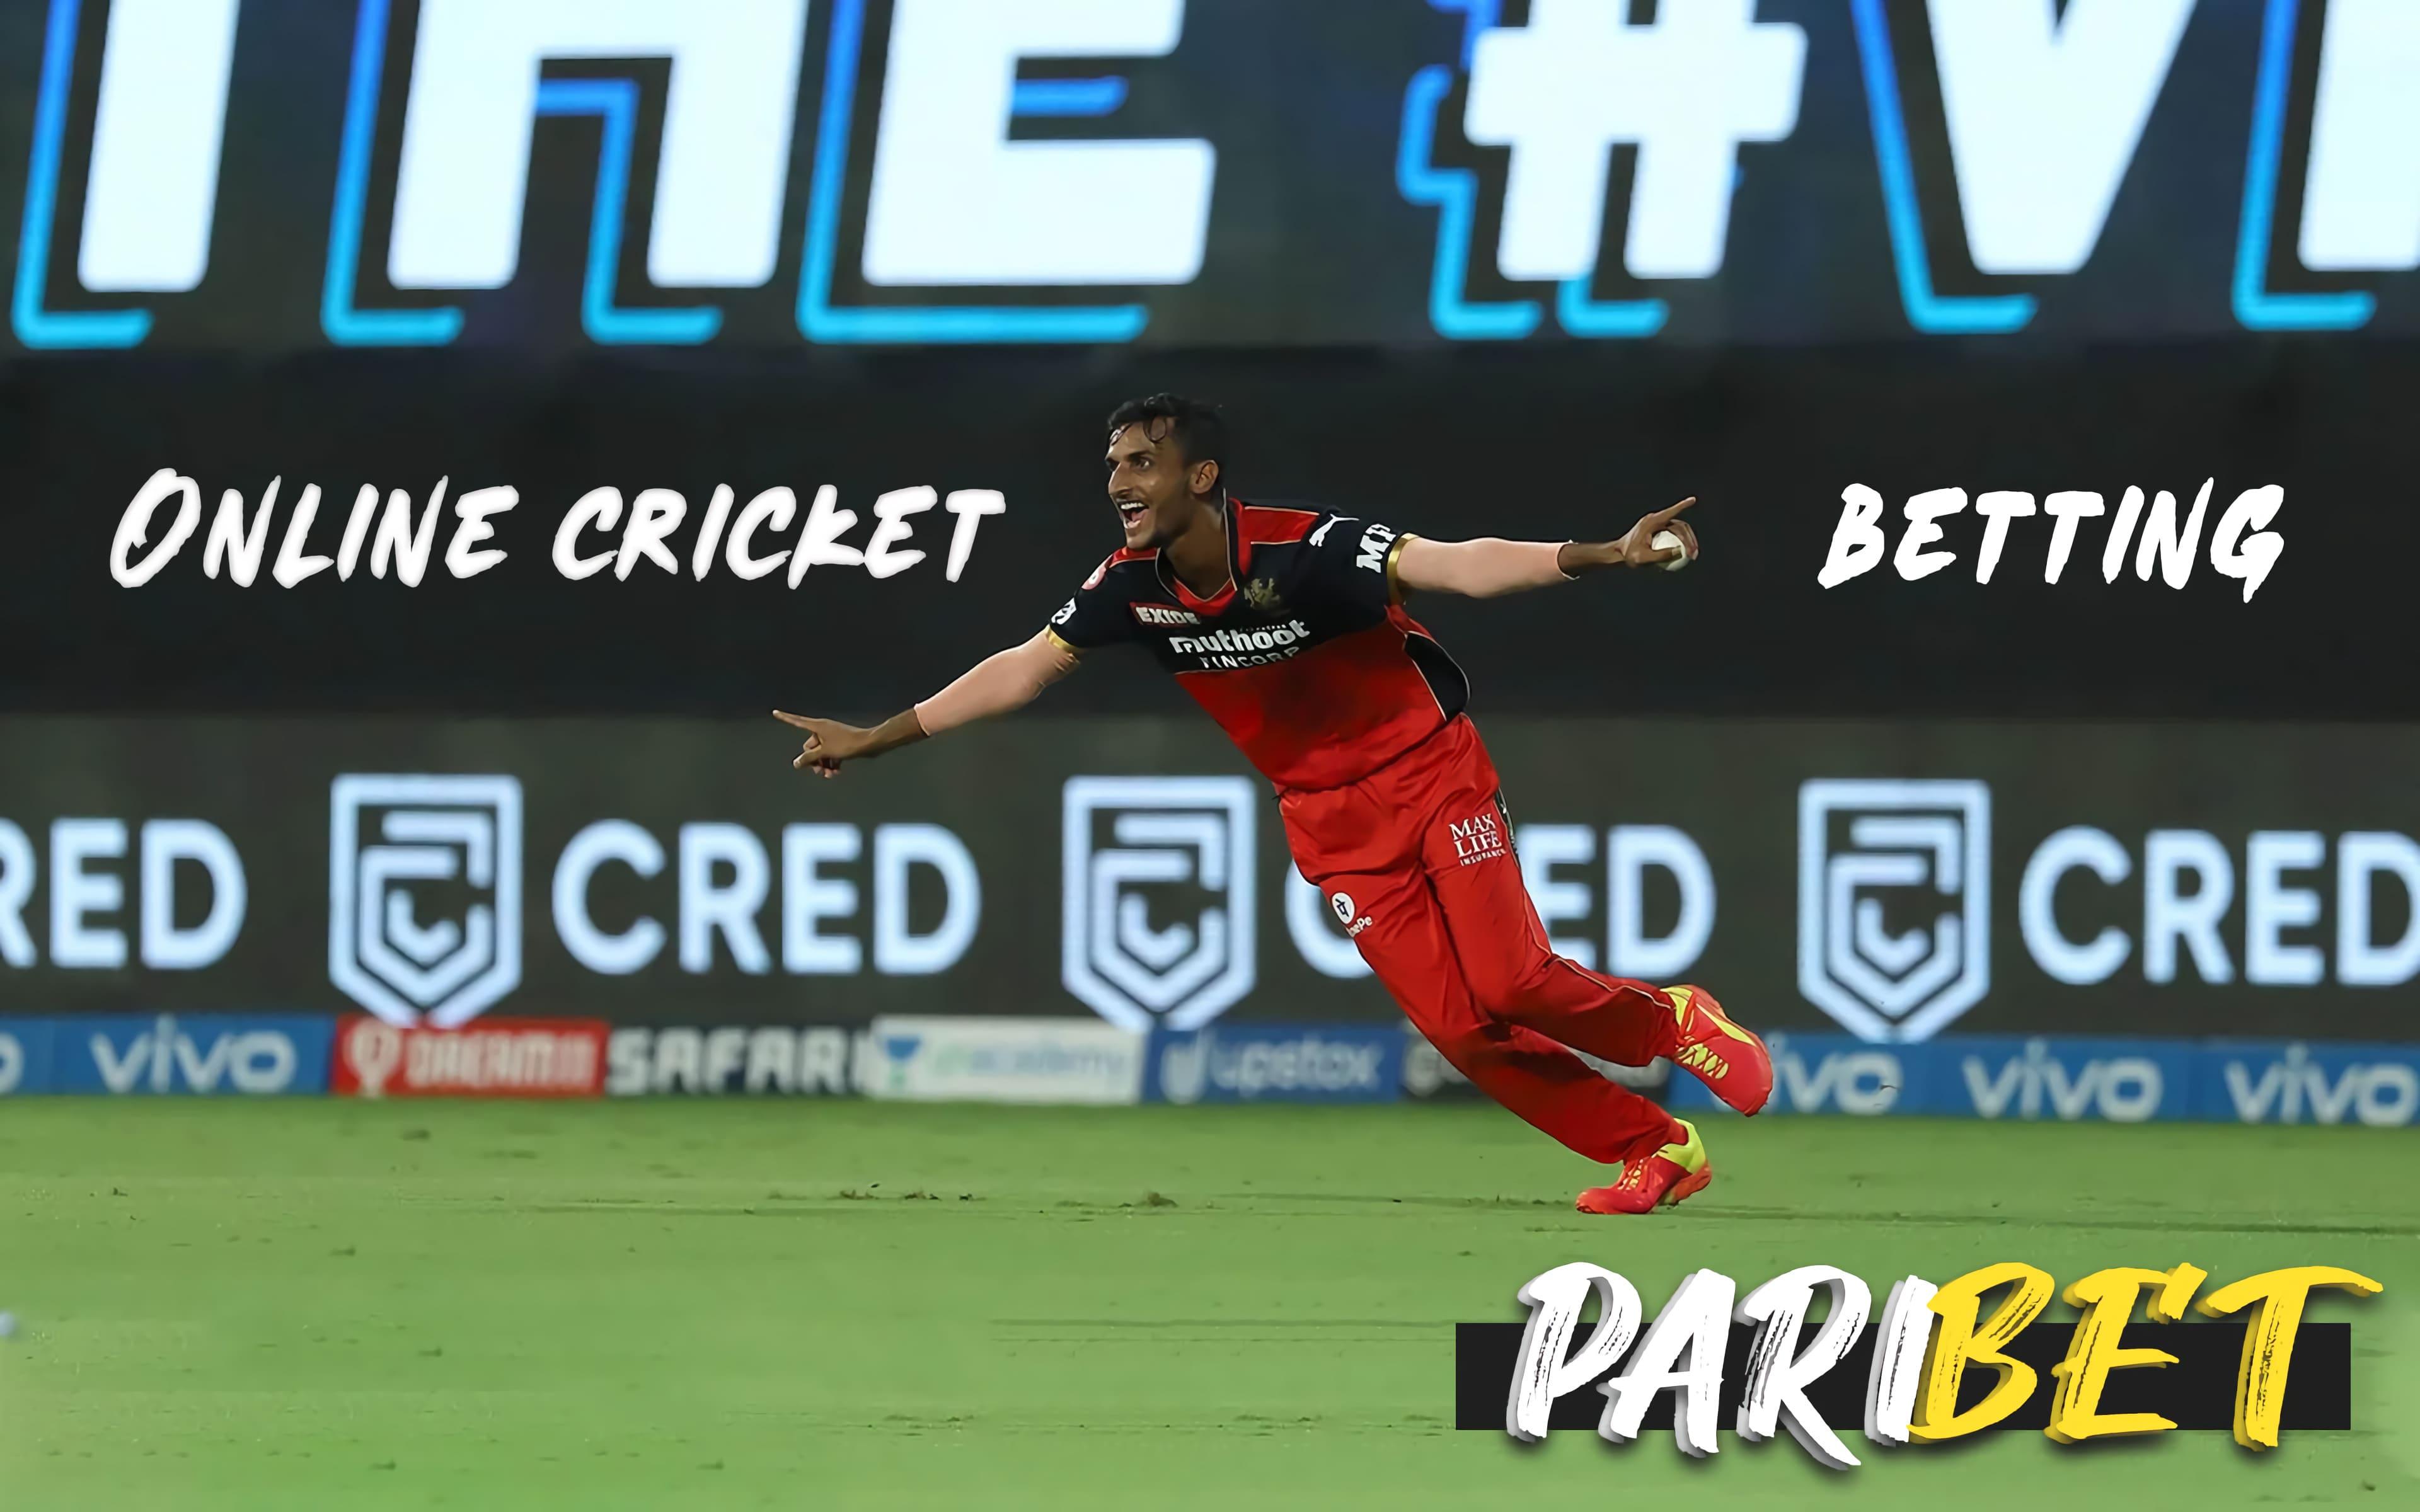 IPL betting app